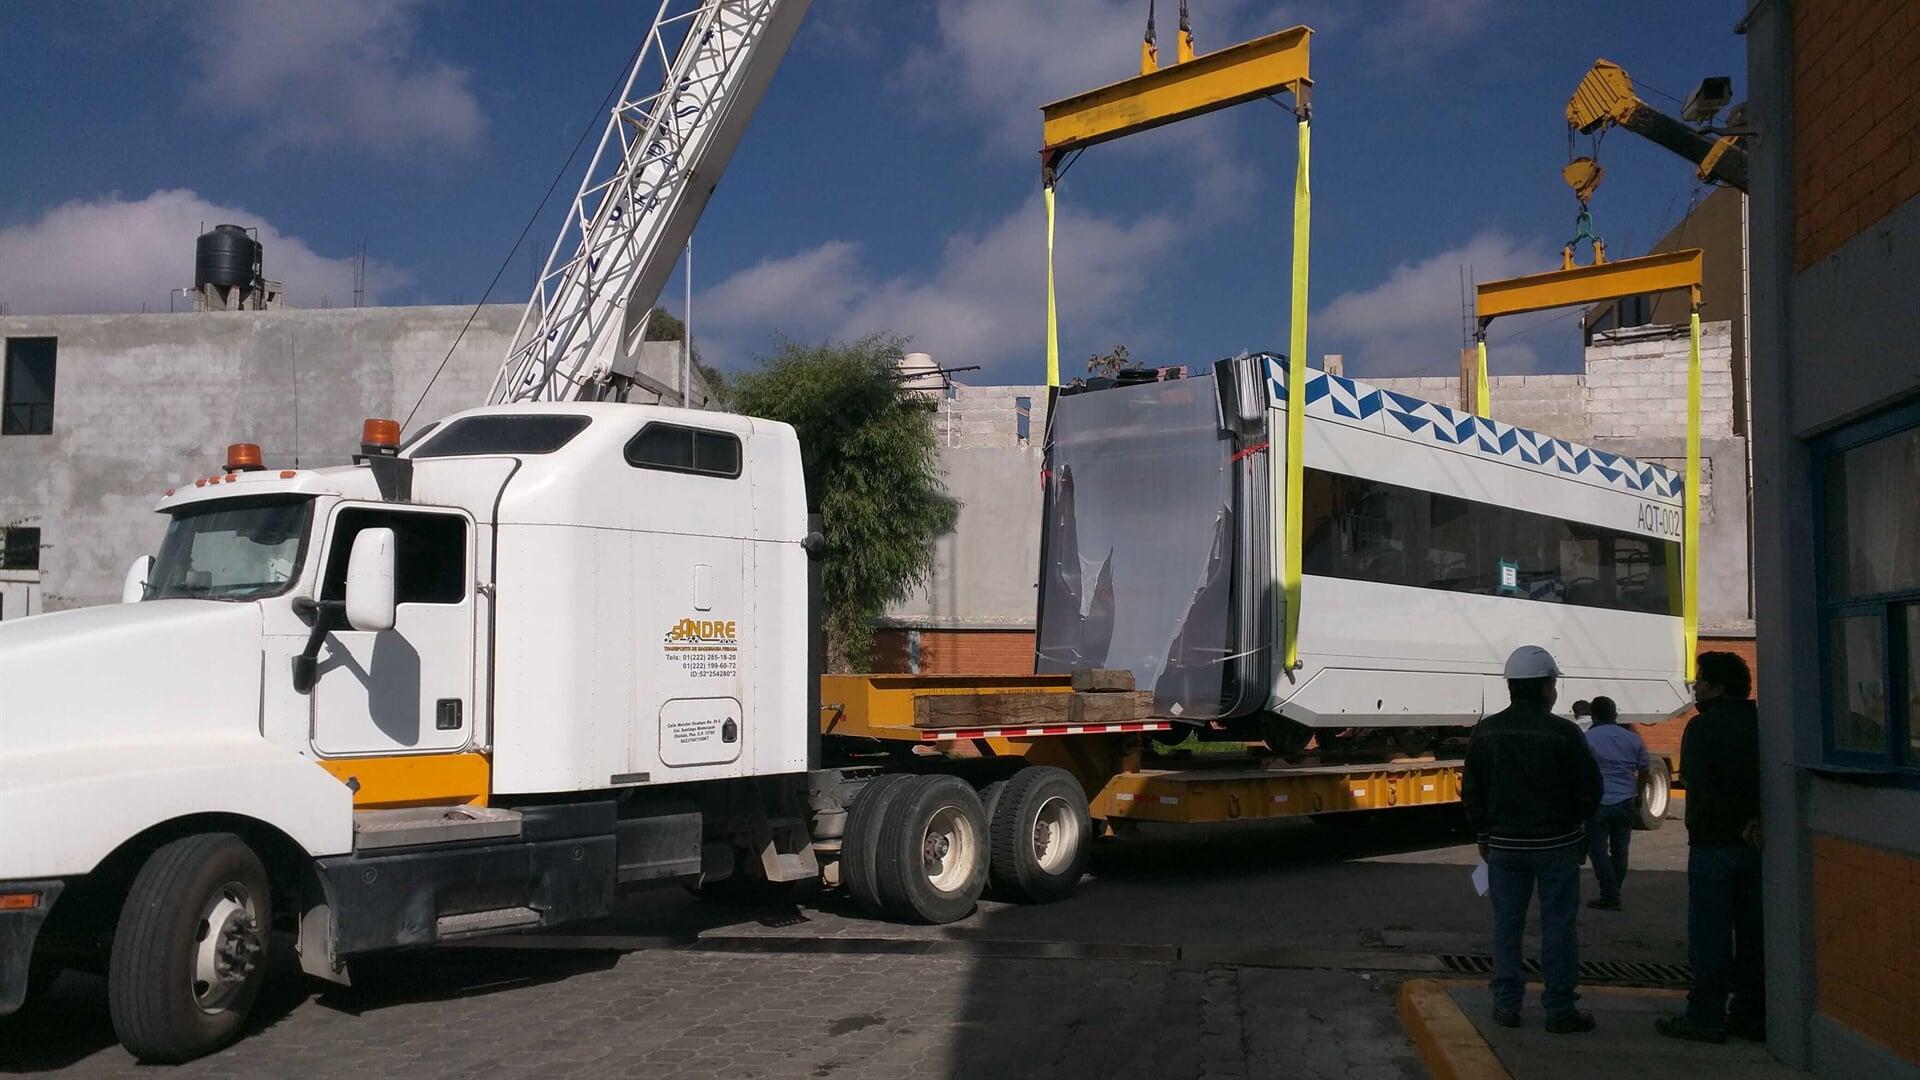 SANDRE TRANSPORTE DE MAQUINARIA - flotilla de Plataformas Lowboy